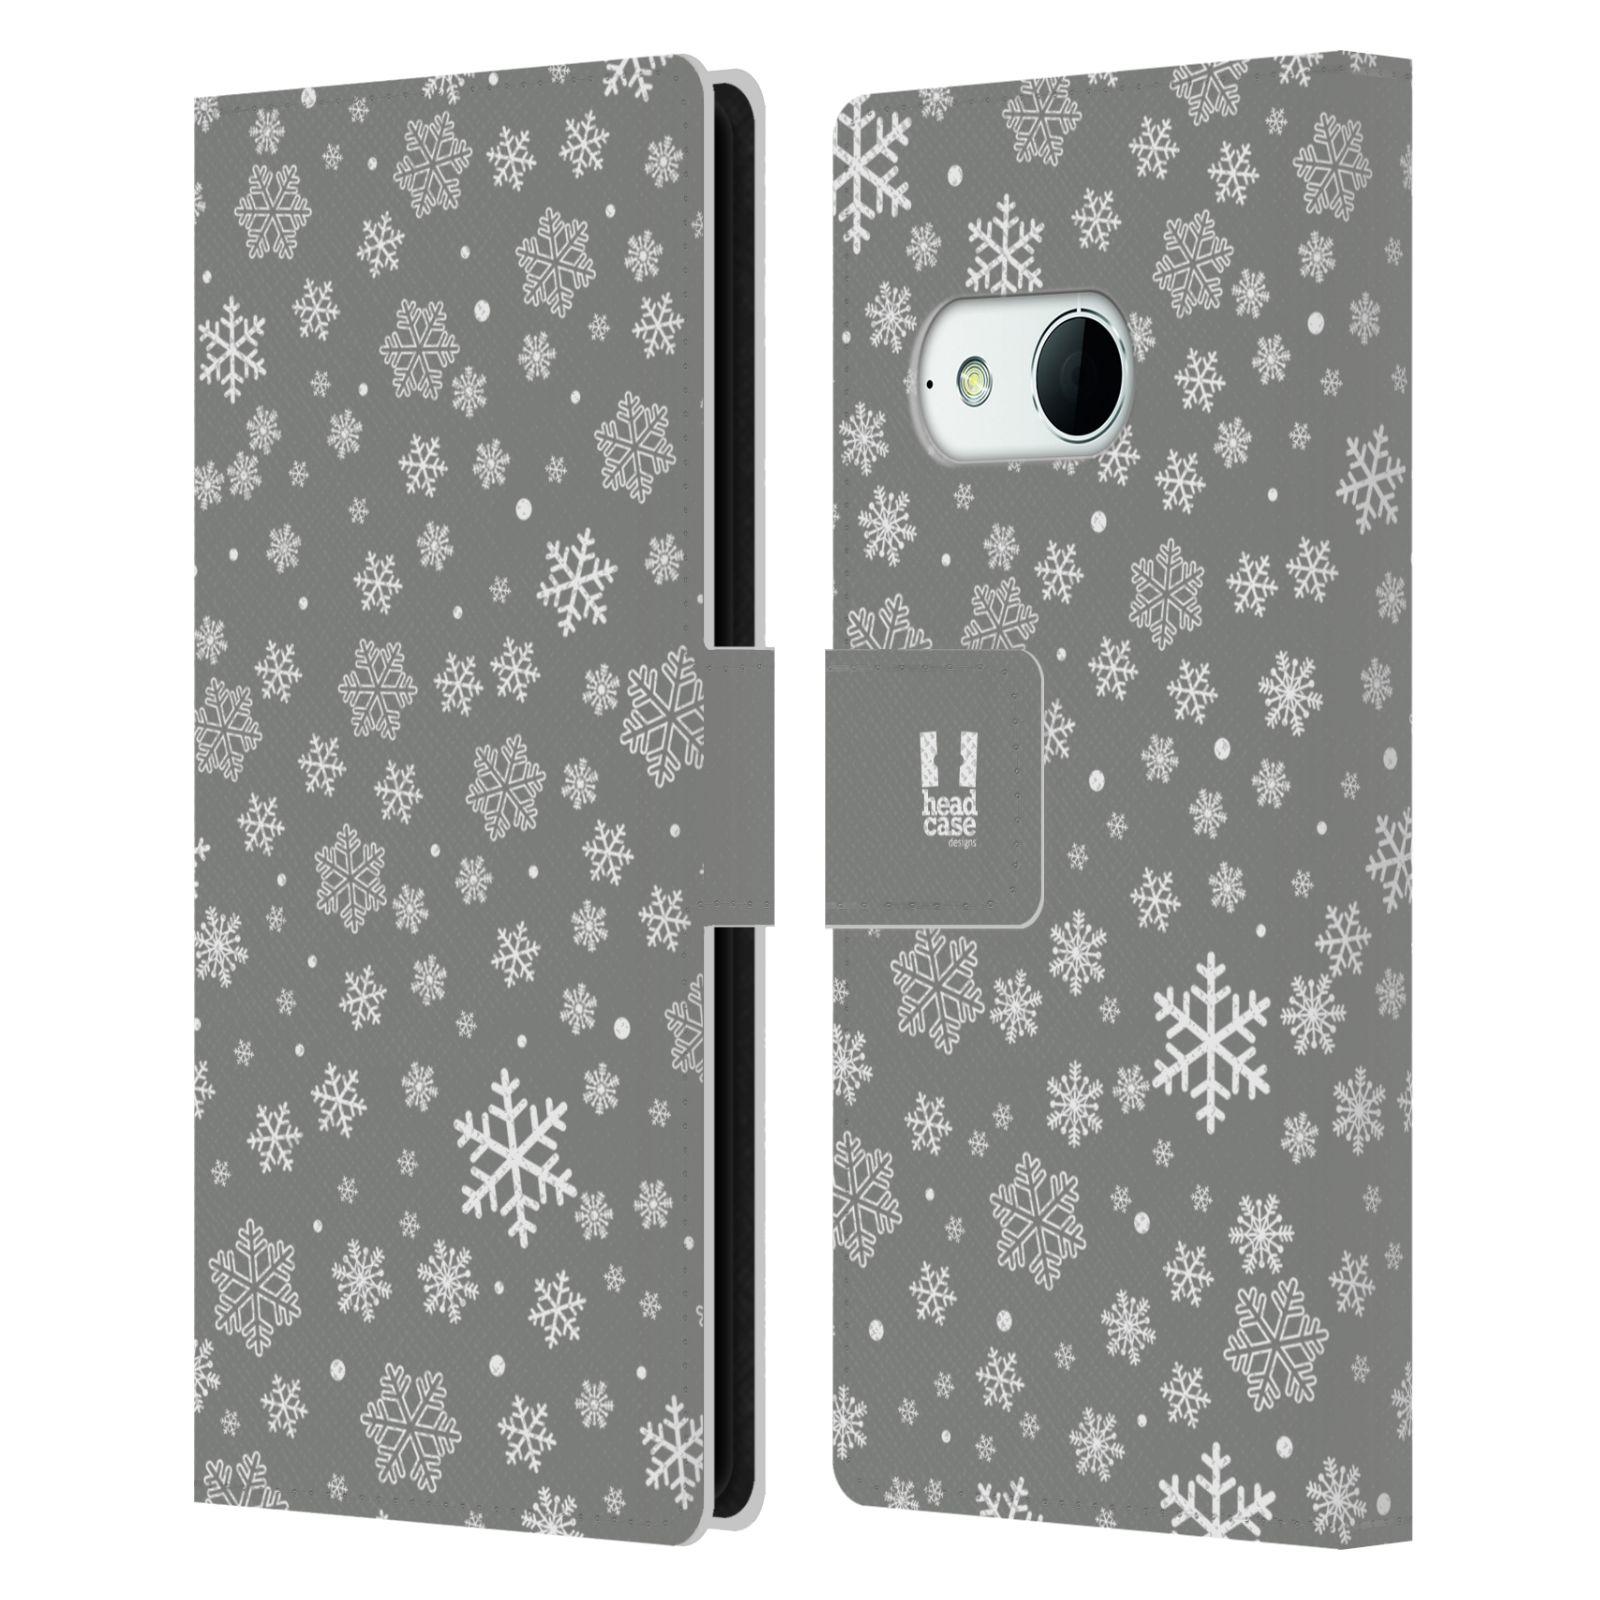 HEAD CASE Flipové pouzdro pro mobil HTC ONE MINI 2 (M8) stříbrné vzory sněžná vločka